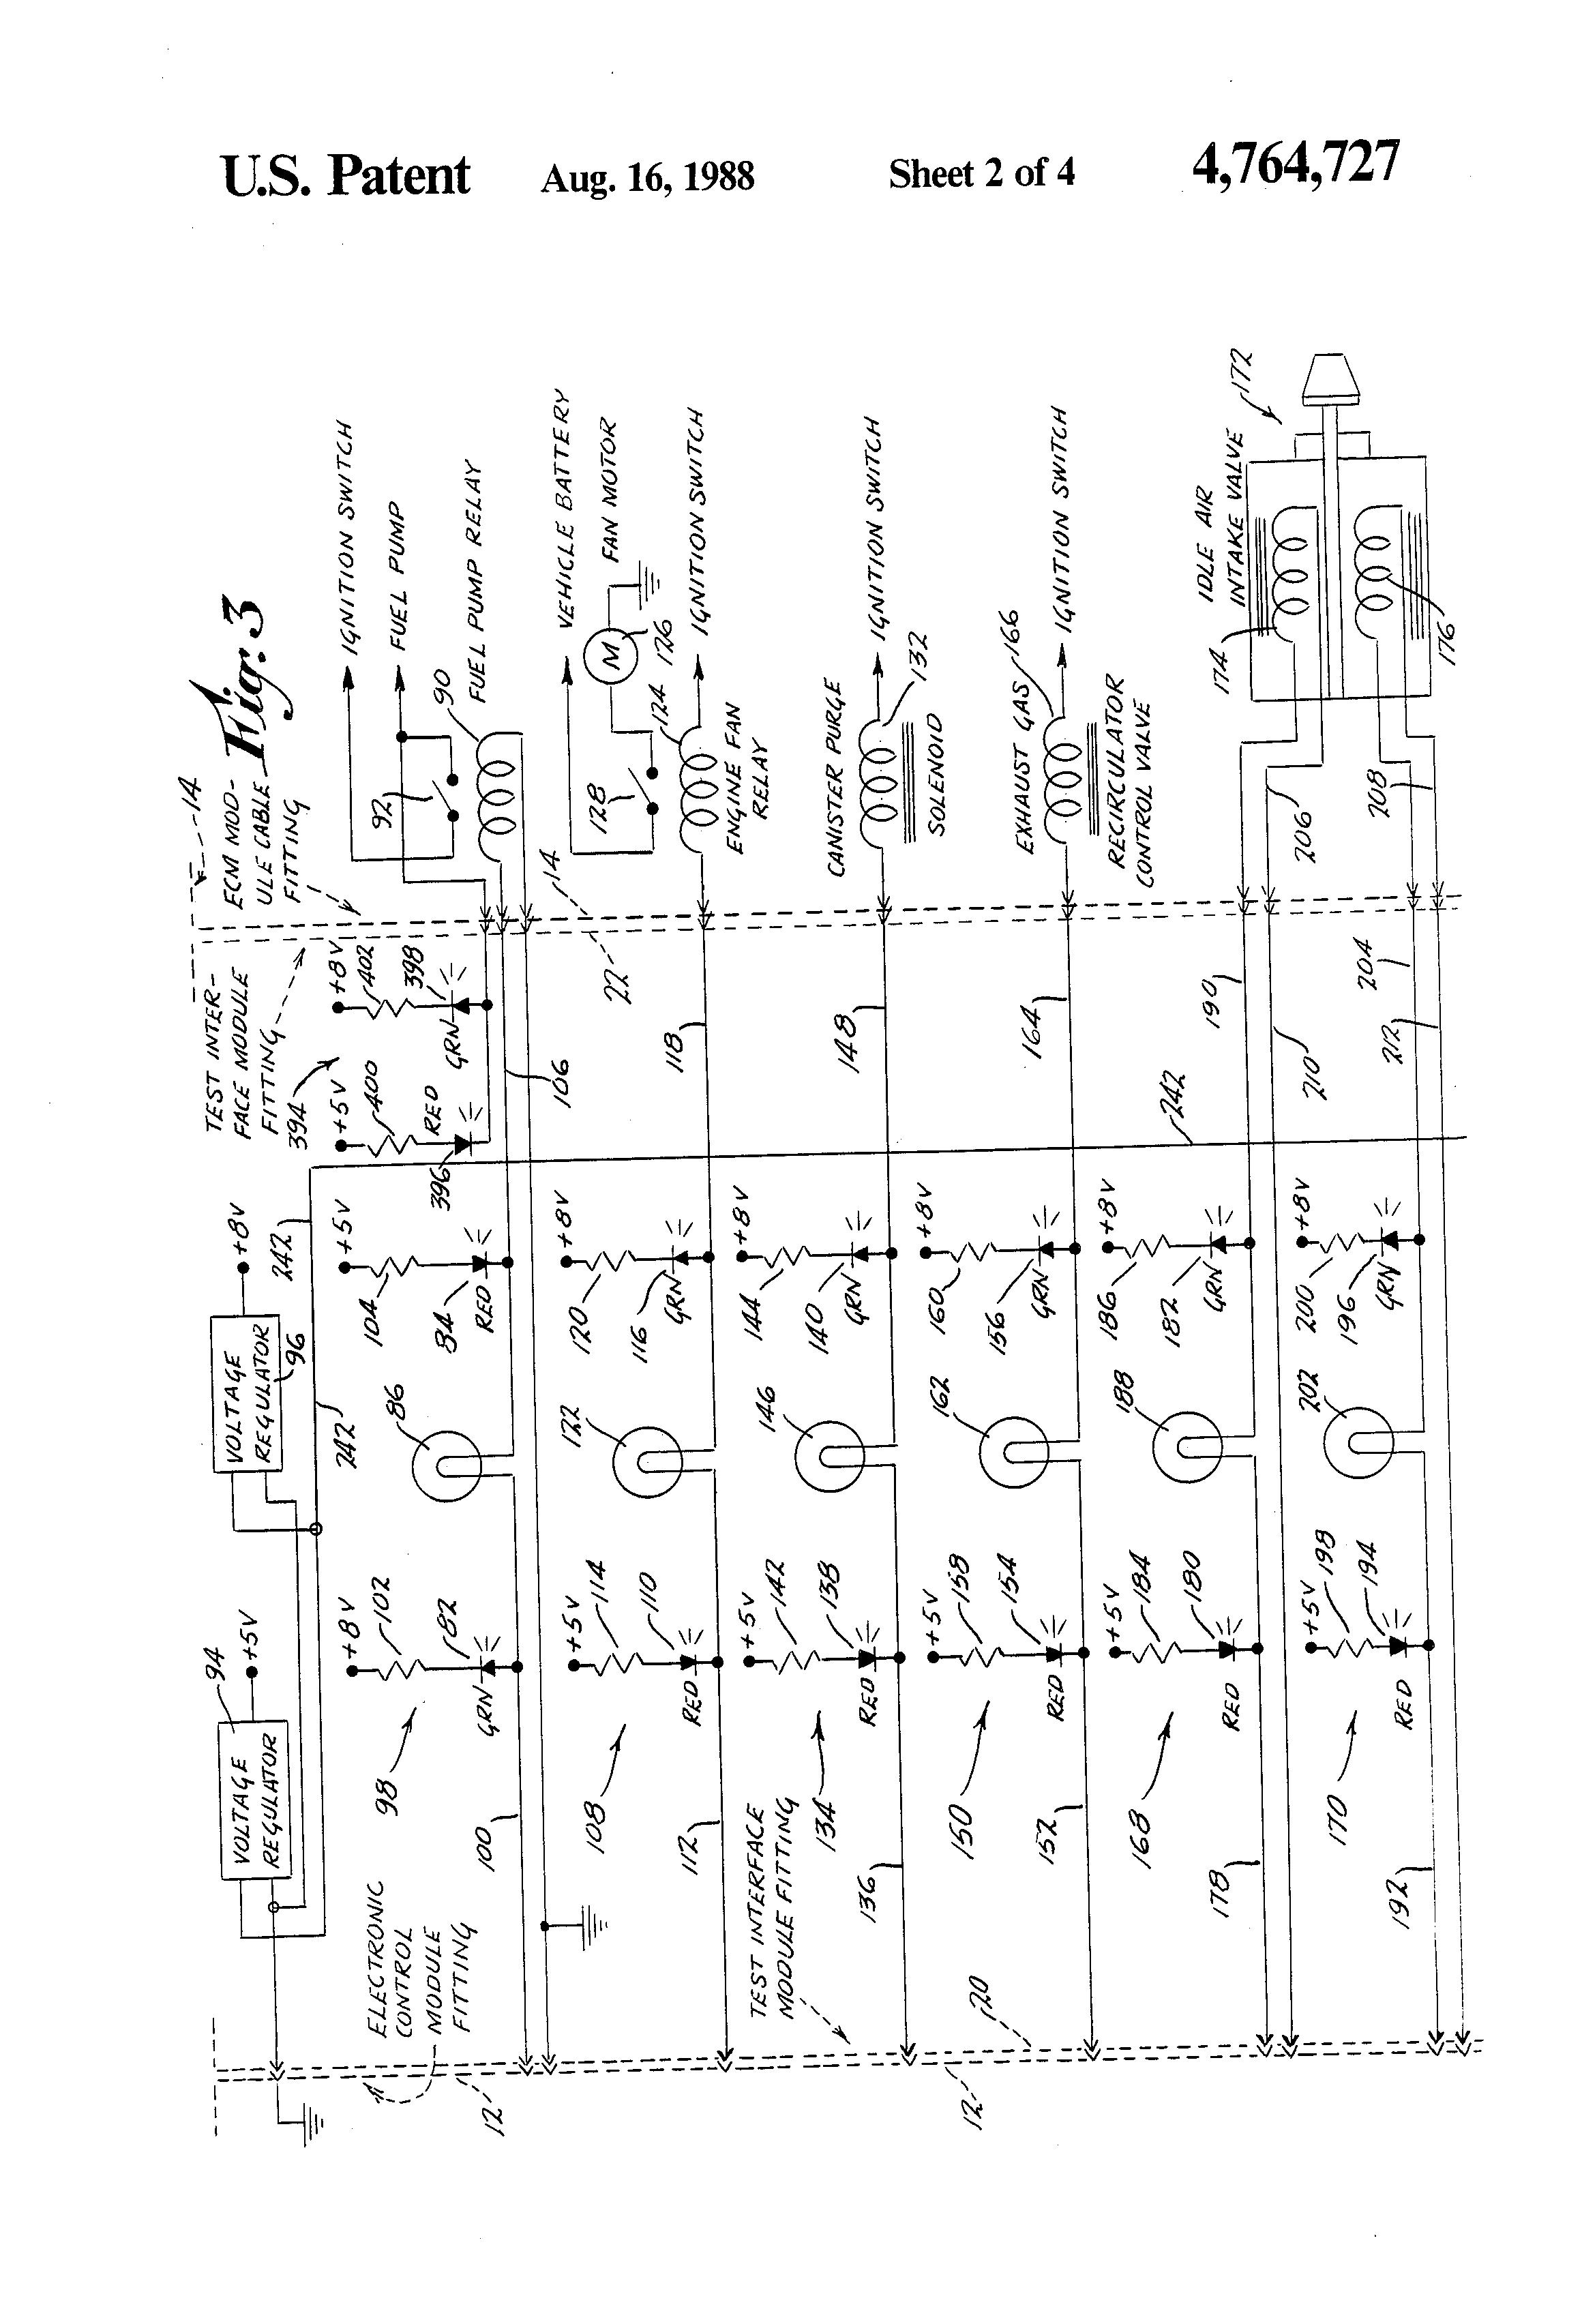 Wiring Diagram Free Schematic Diagram 07 01 2009 08 01 2009 John Deere